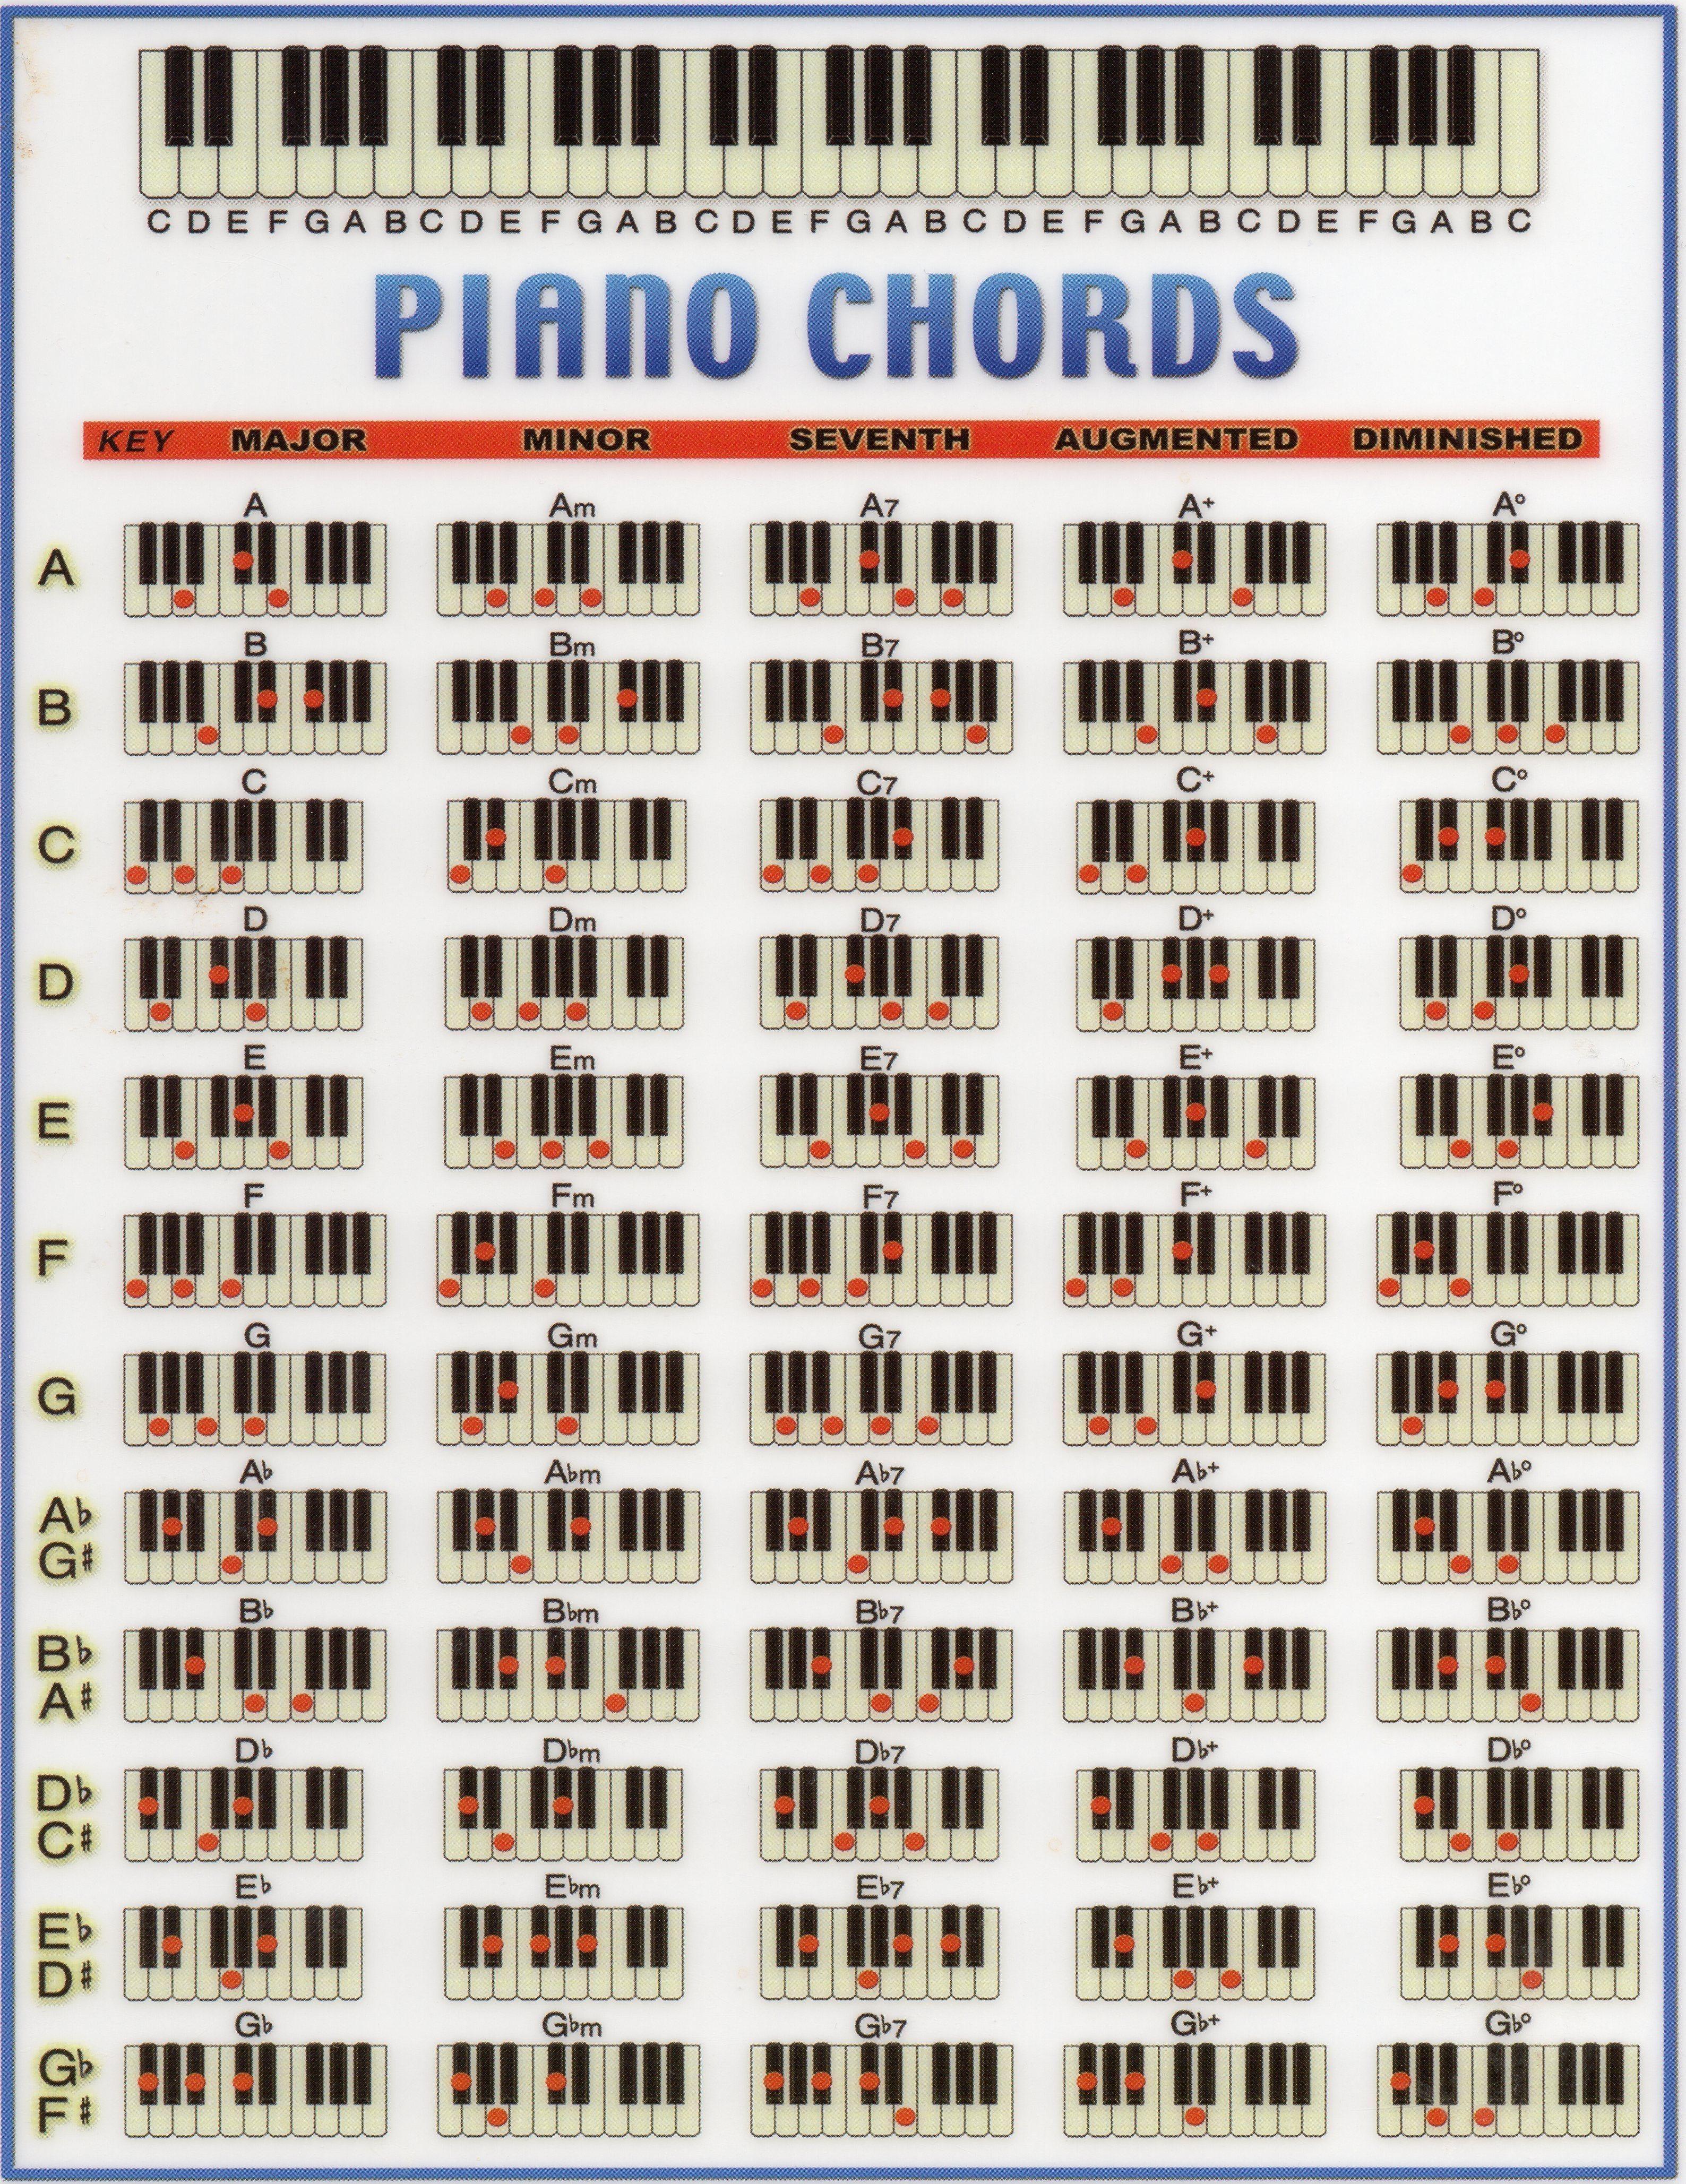 10 Printable Chord Chart Piano in 2020 Piano chords